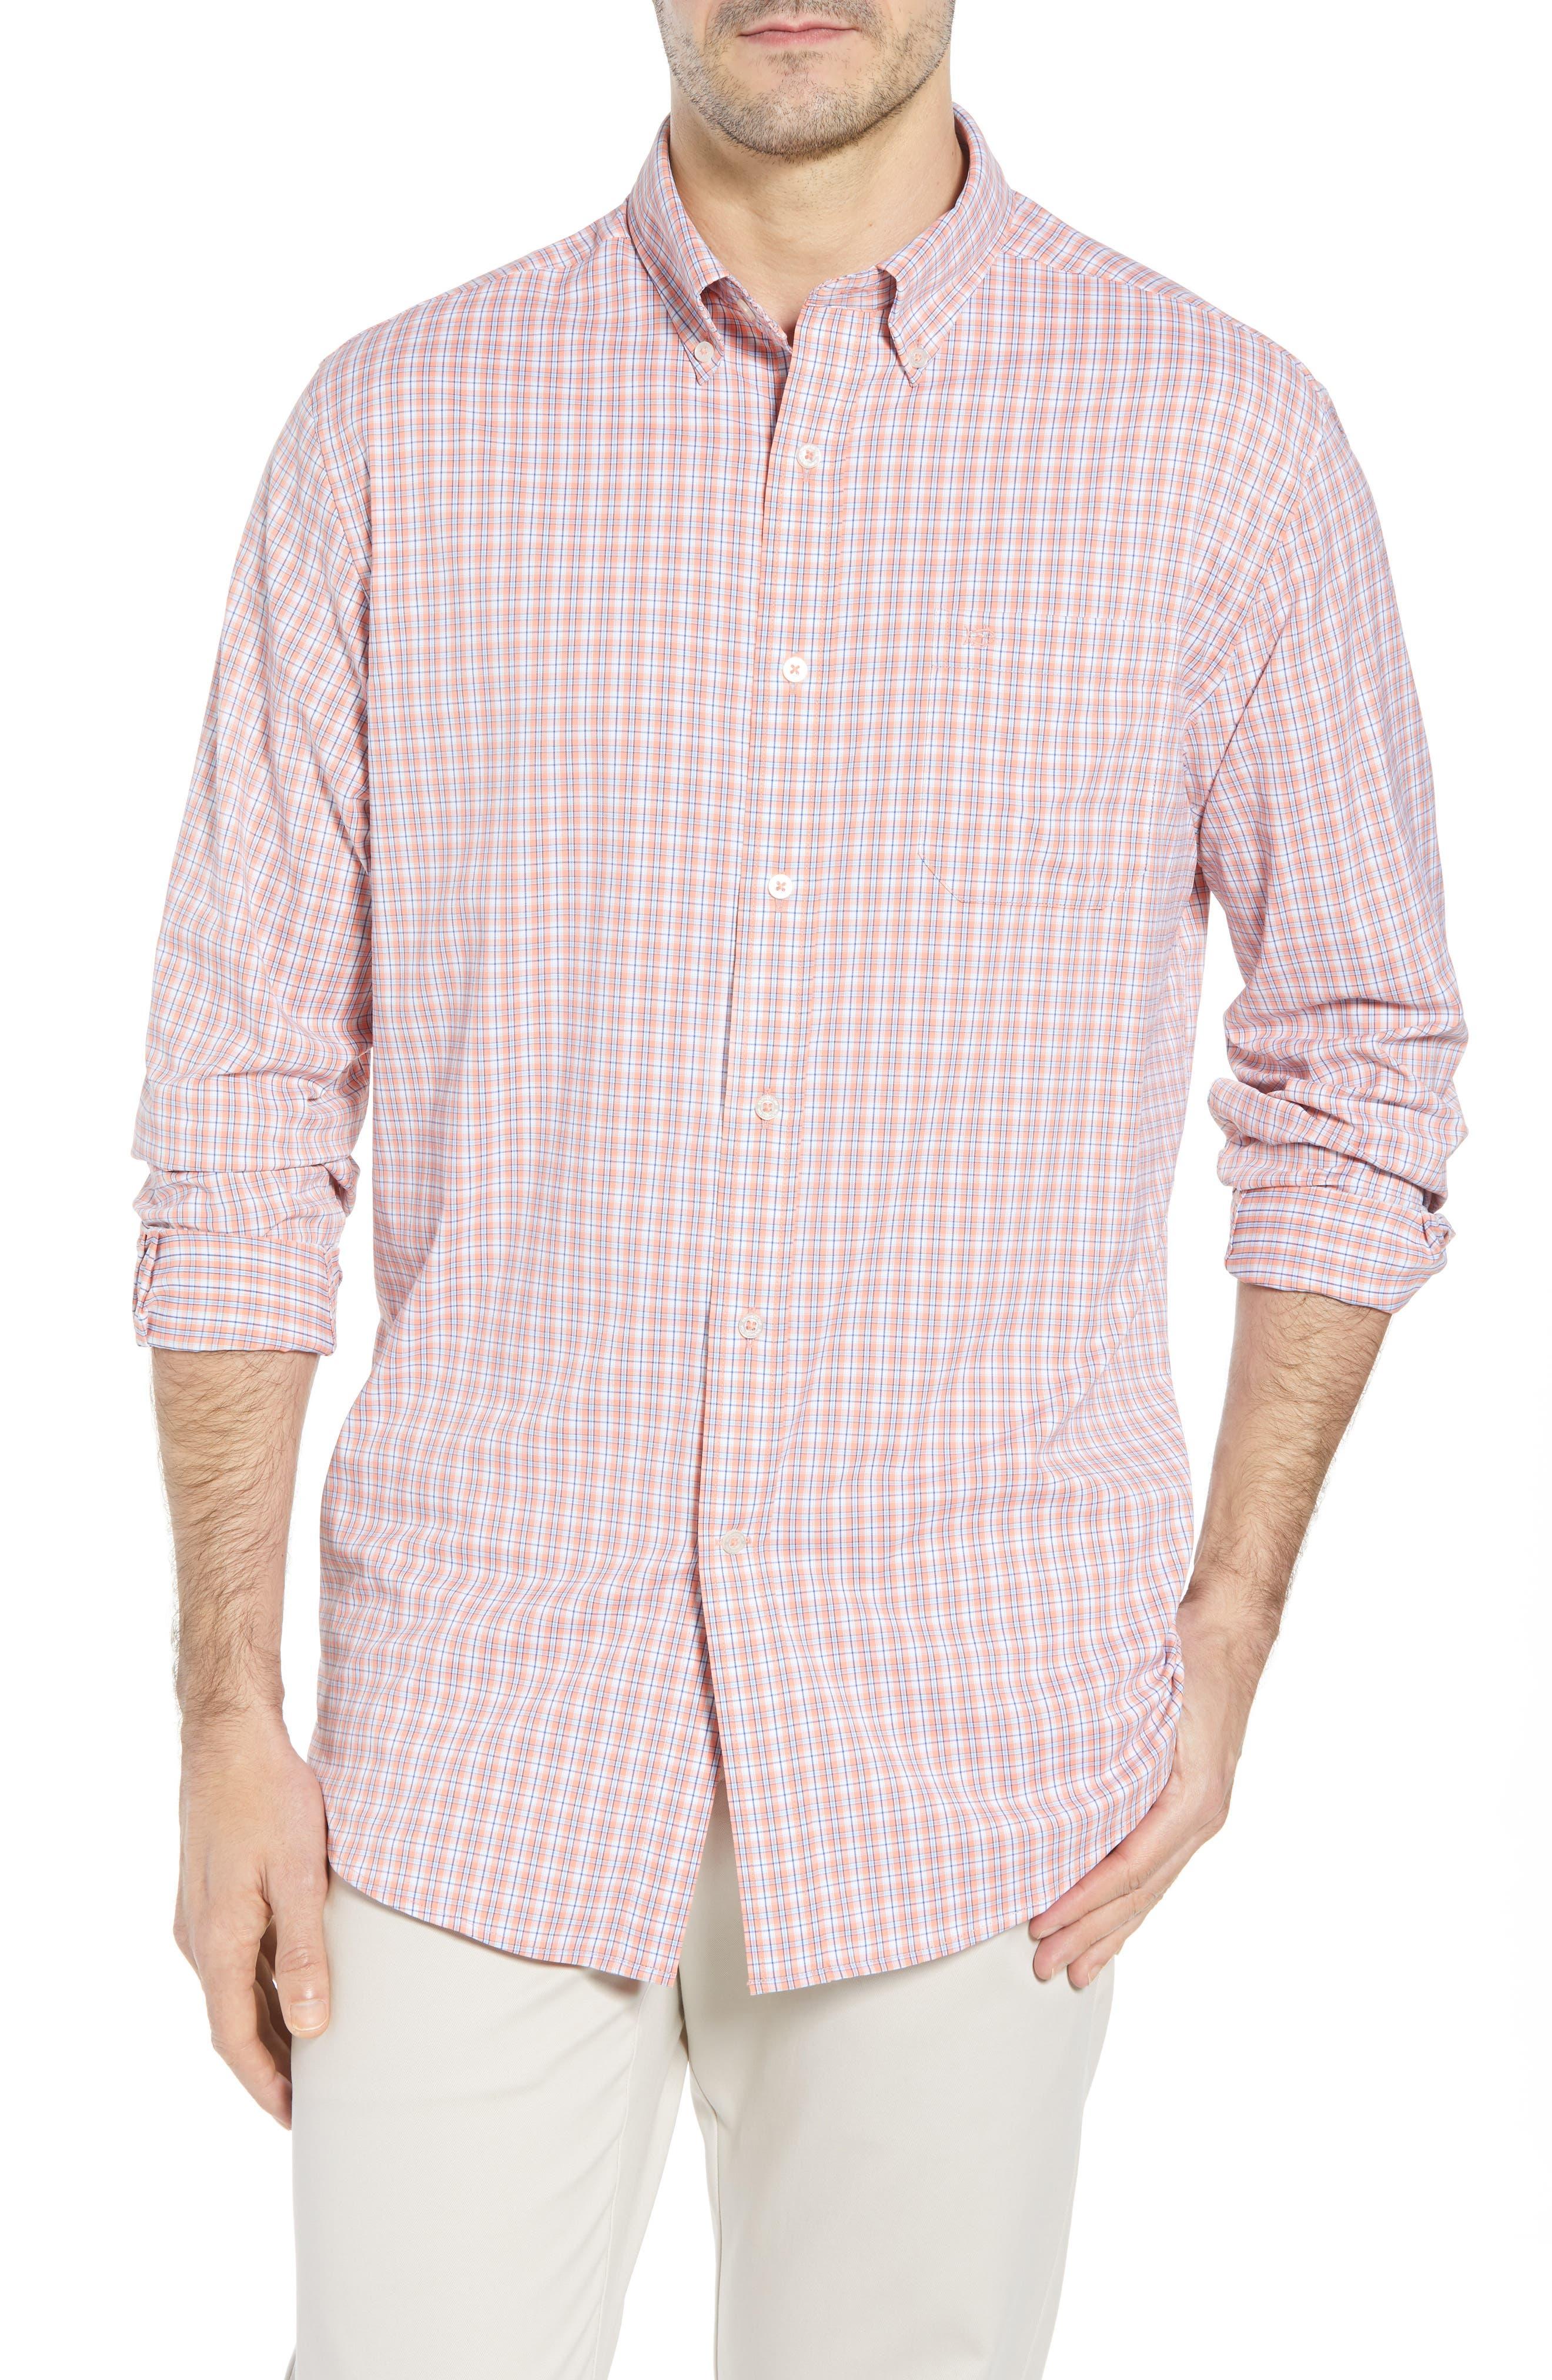 Grand Turk Regular Fit Stretch Plaid Sport Shirt,                             Main thumbnail 1, color,                             801